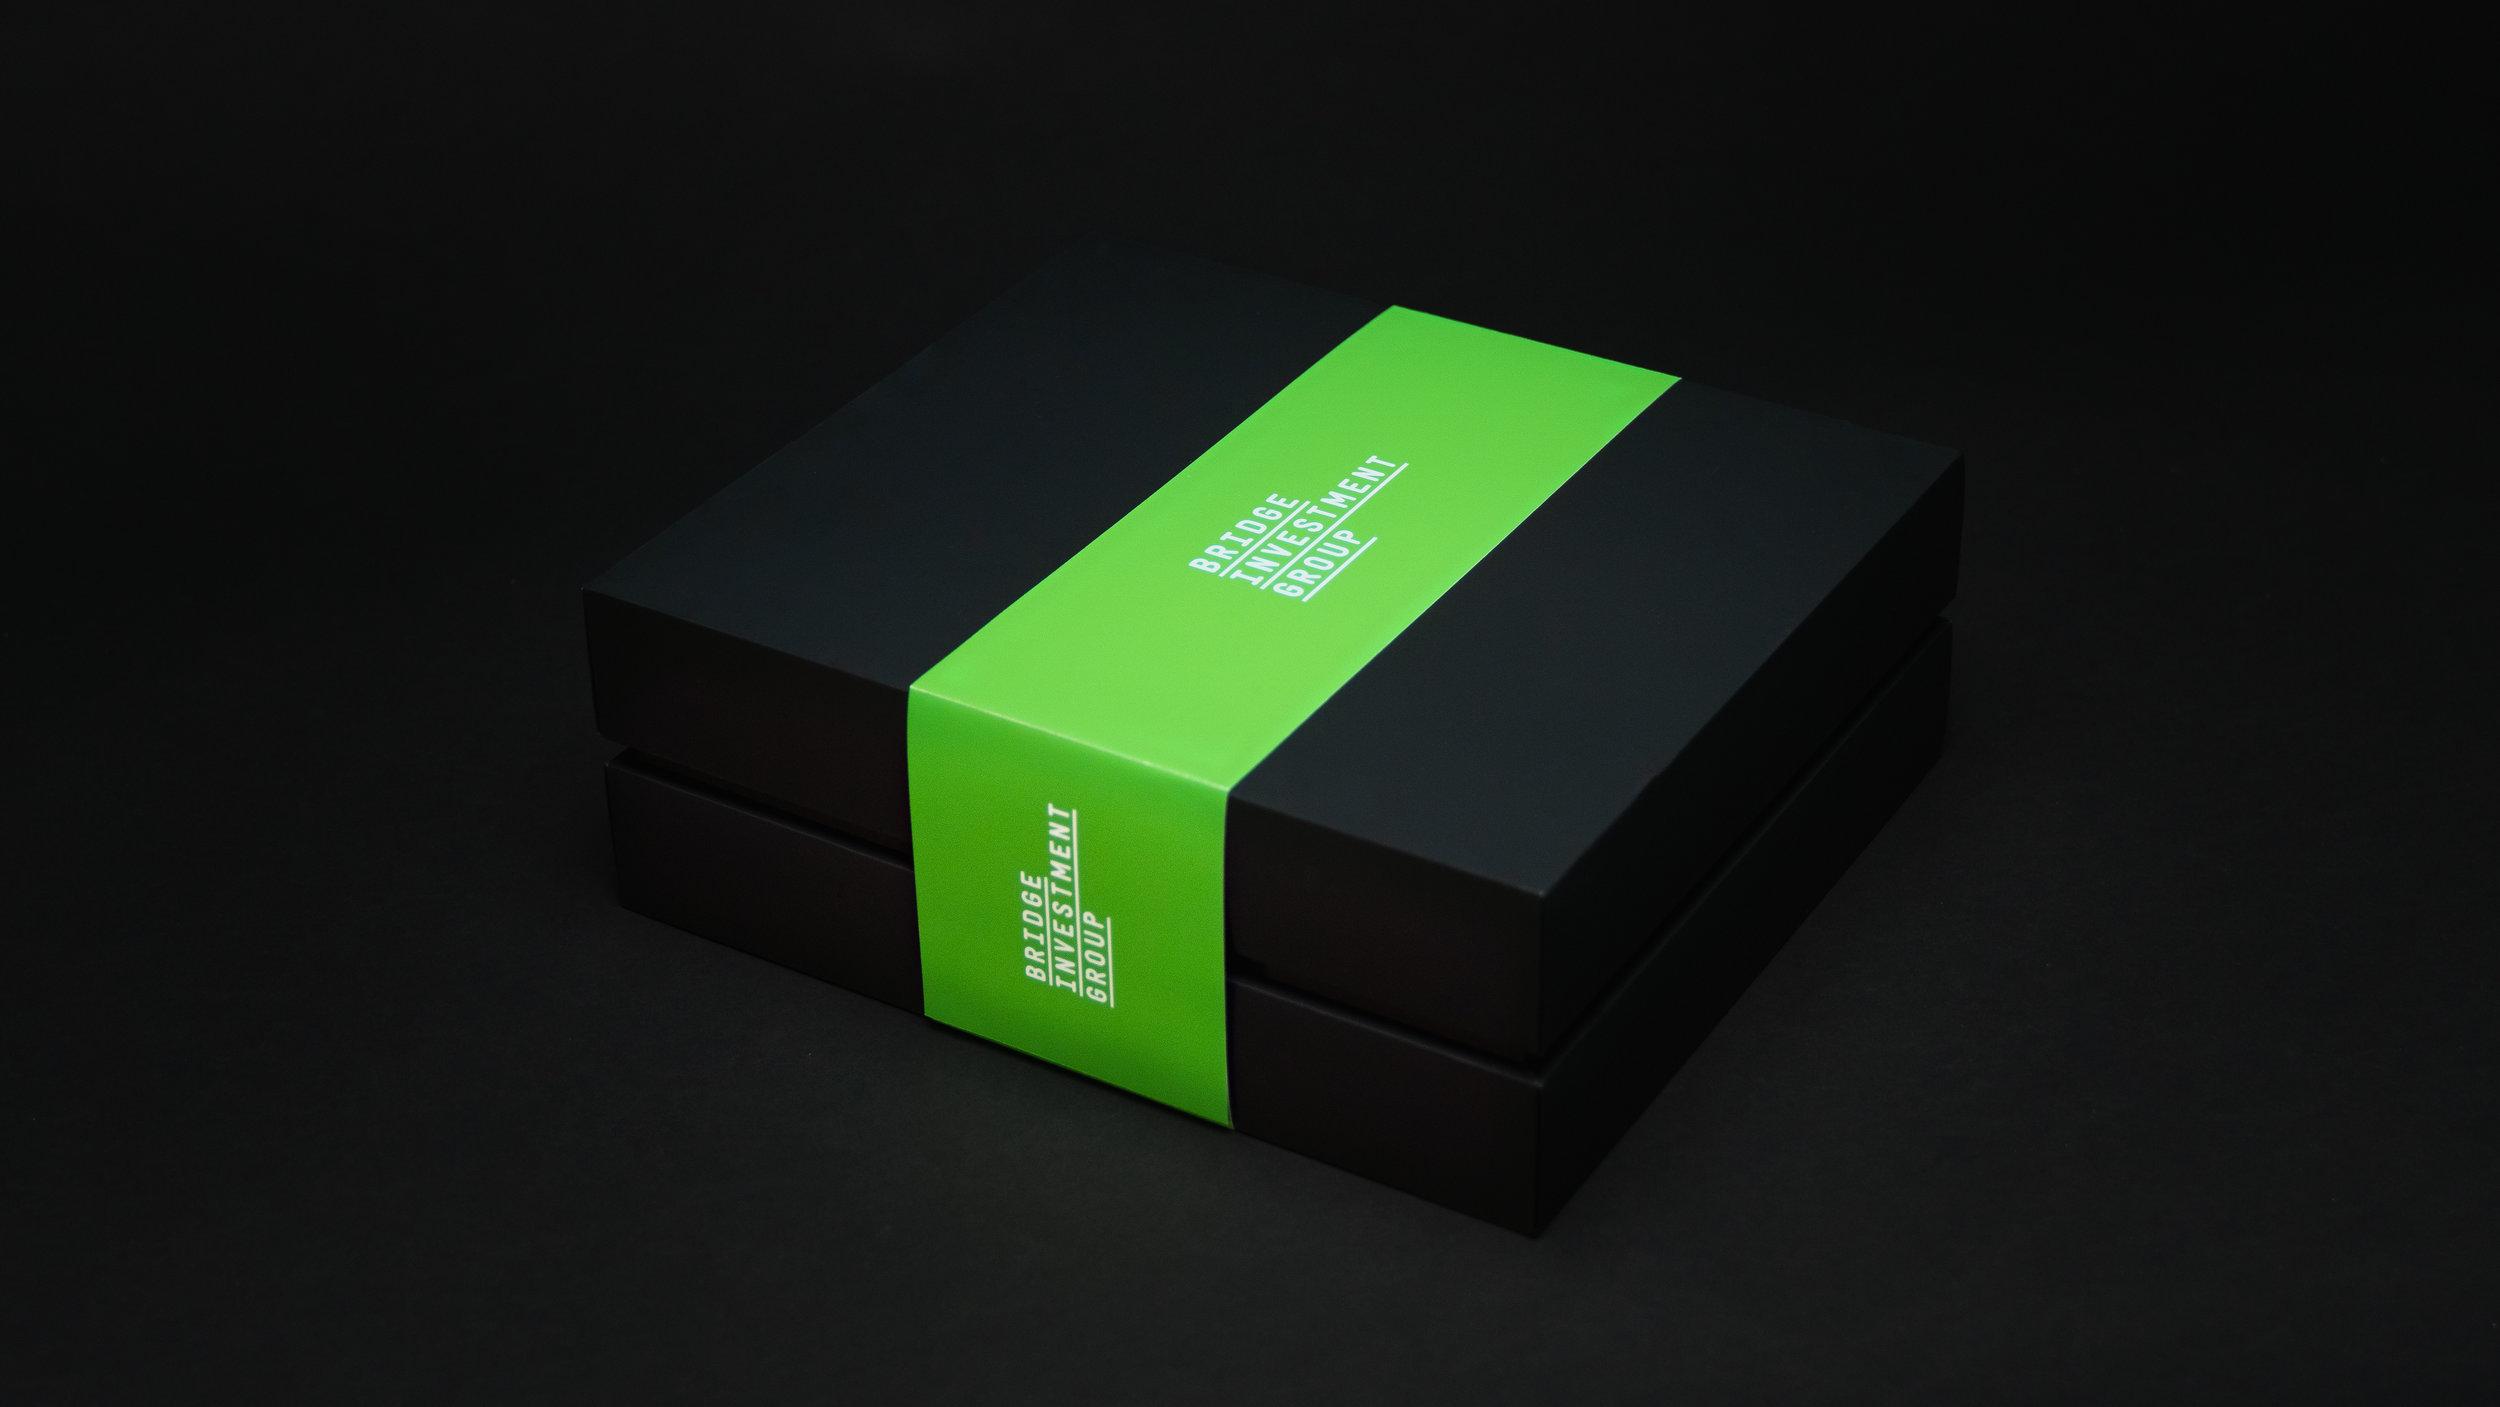 BridgeGlass-Box (1 of 2).jpg